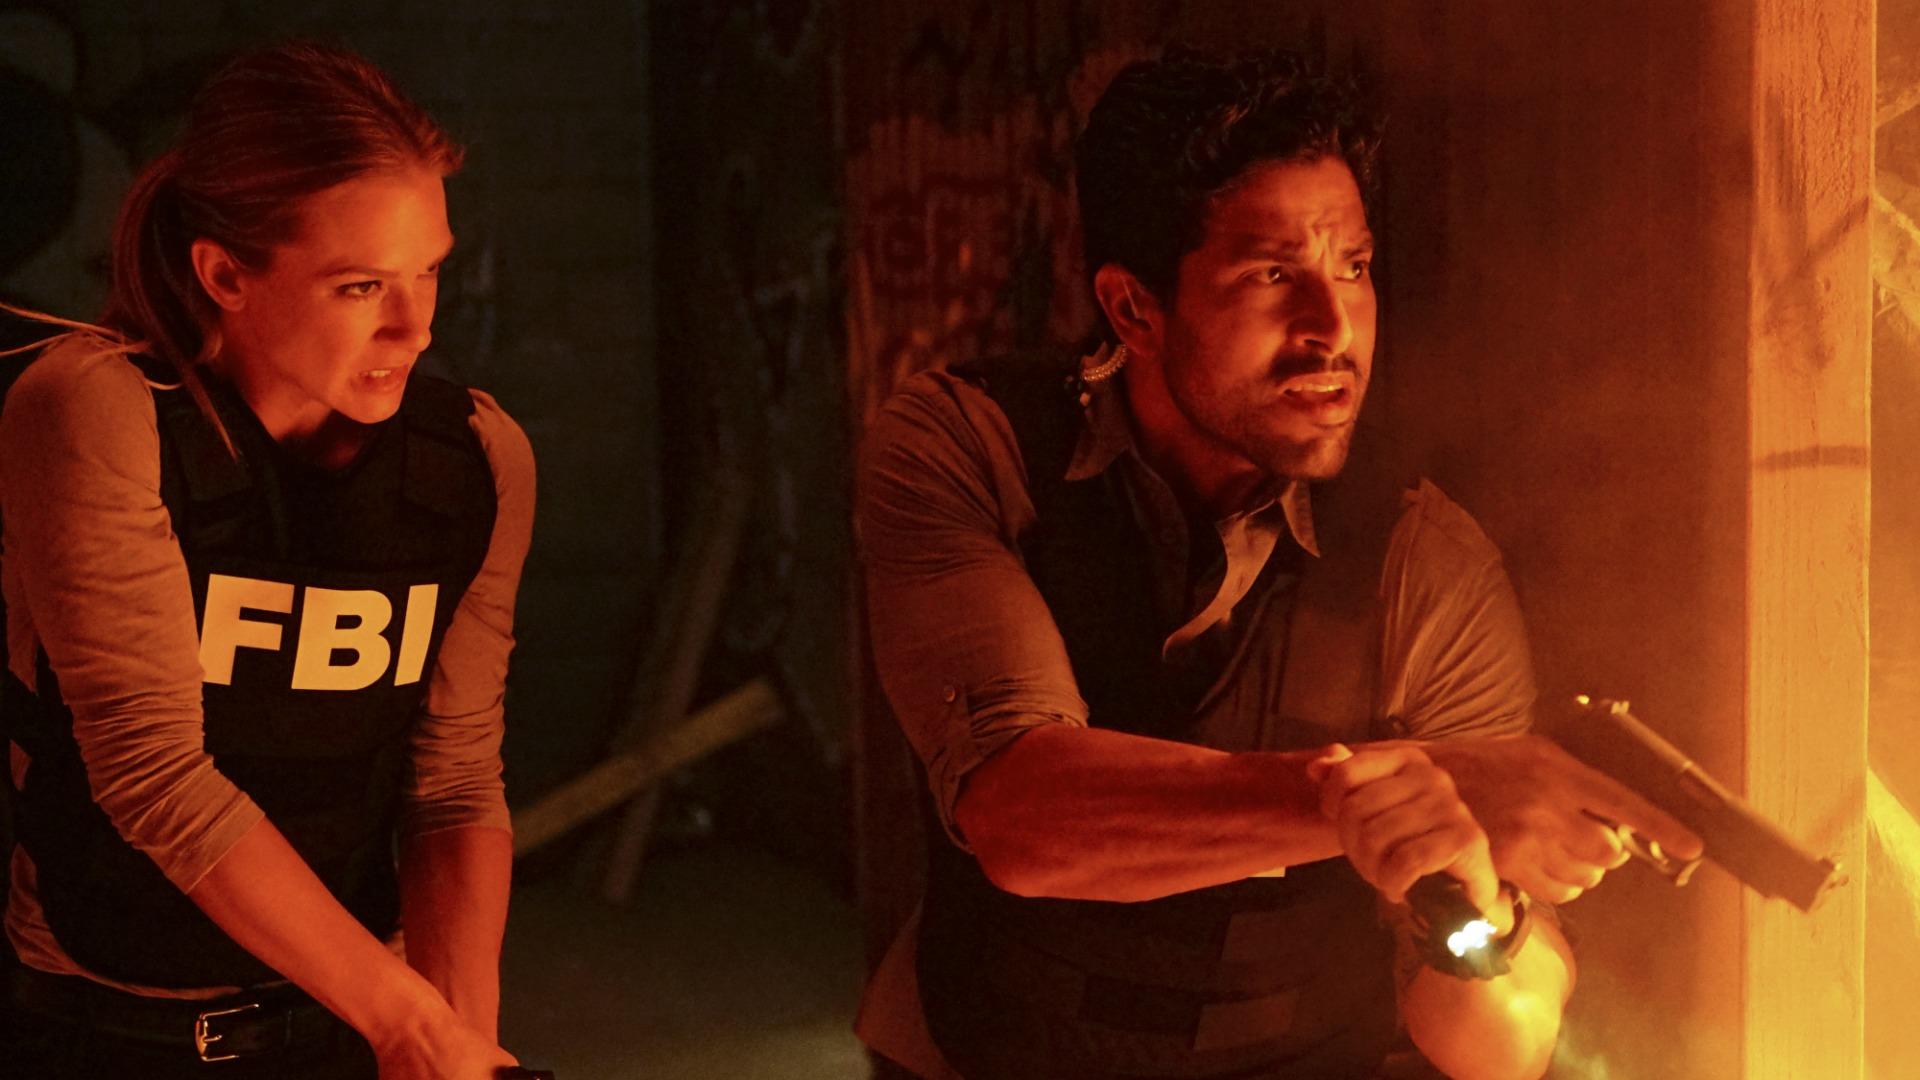 JJ and Agent Alvez prepare to enter a burning building.